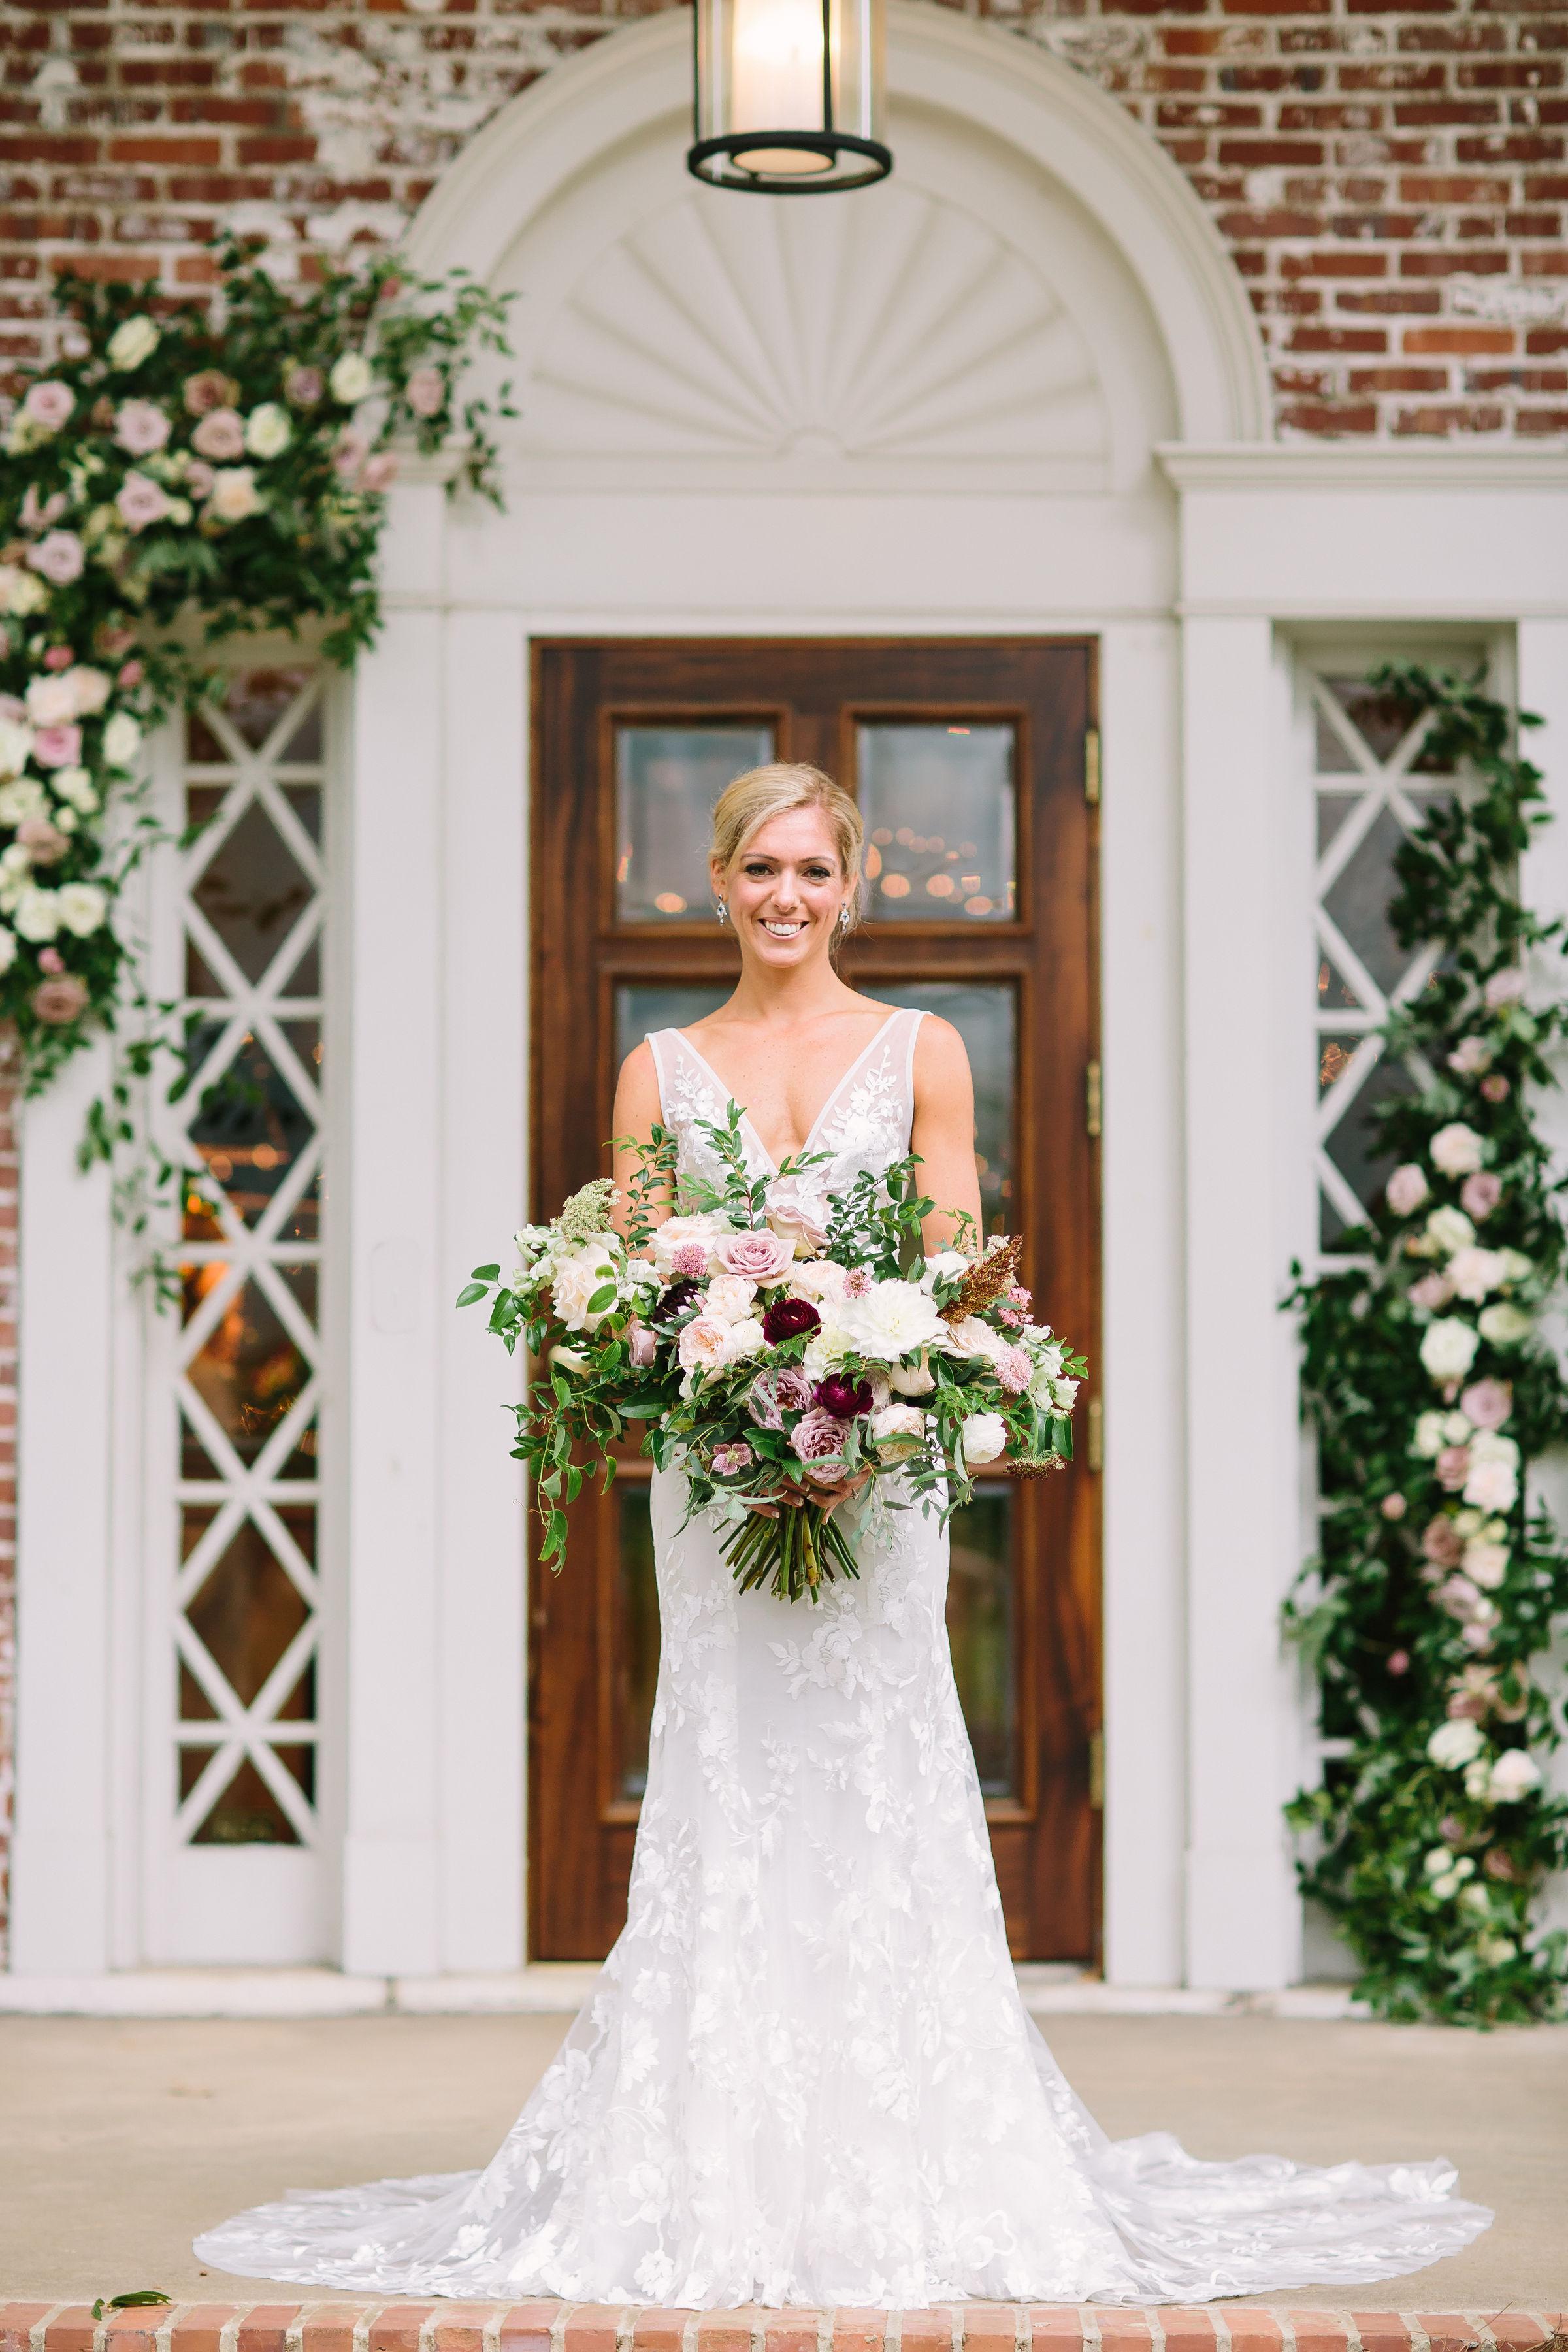 Natural, asymmetrical bridal bouquet with soft mauve garden roses, eggplant ranunculus, and trailing greenery // Nashville, TN Floral Designer